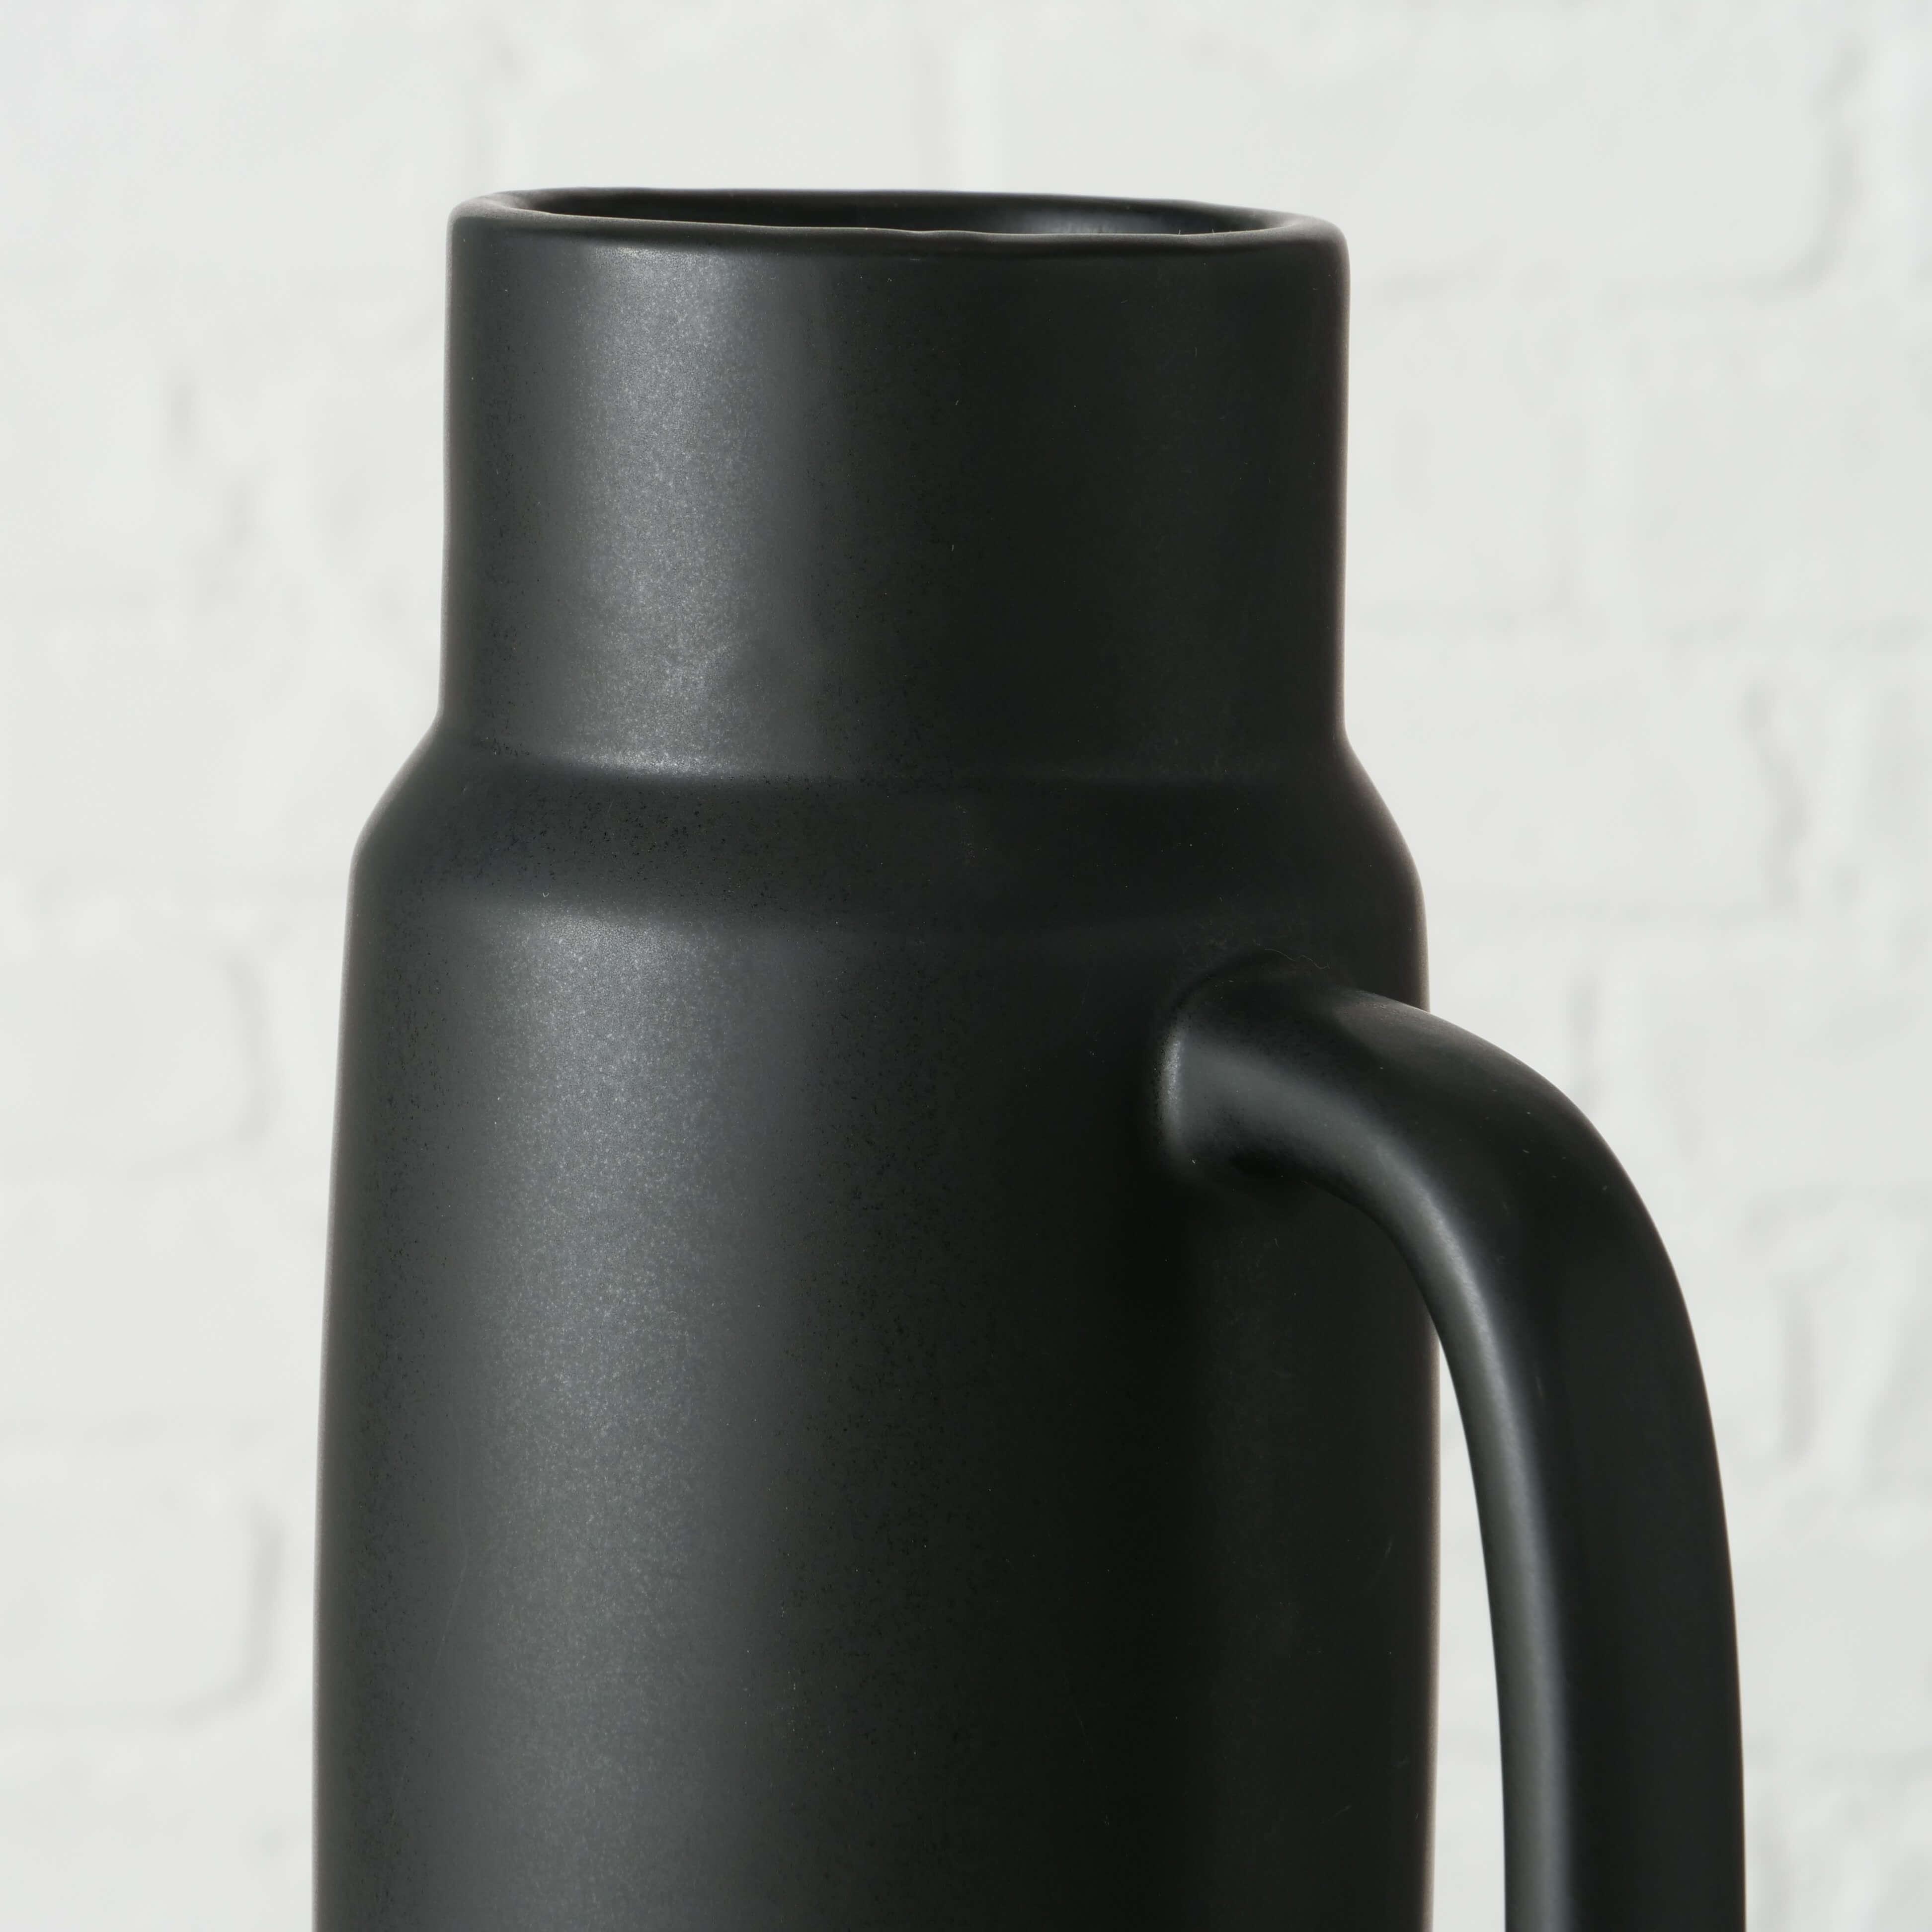 Vase PALERMO mit Henkel, Keramik 31 cm